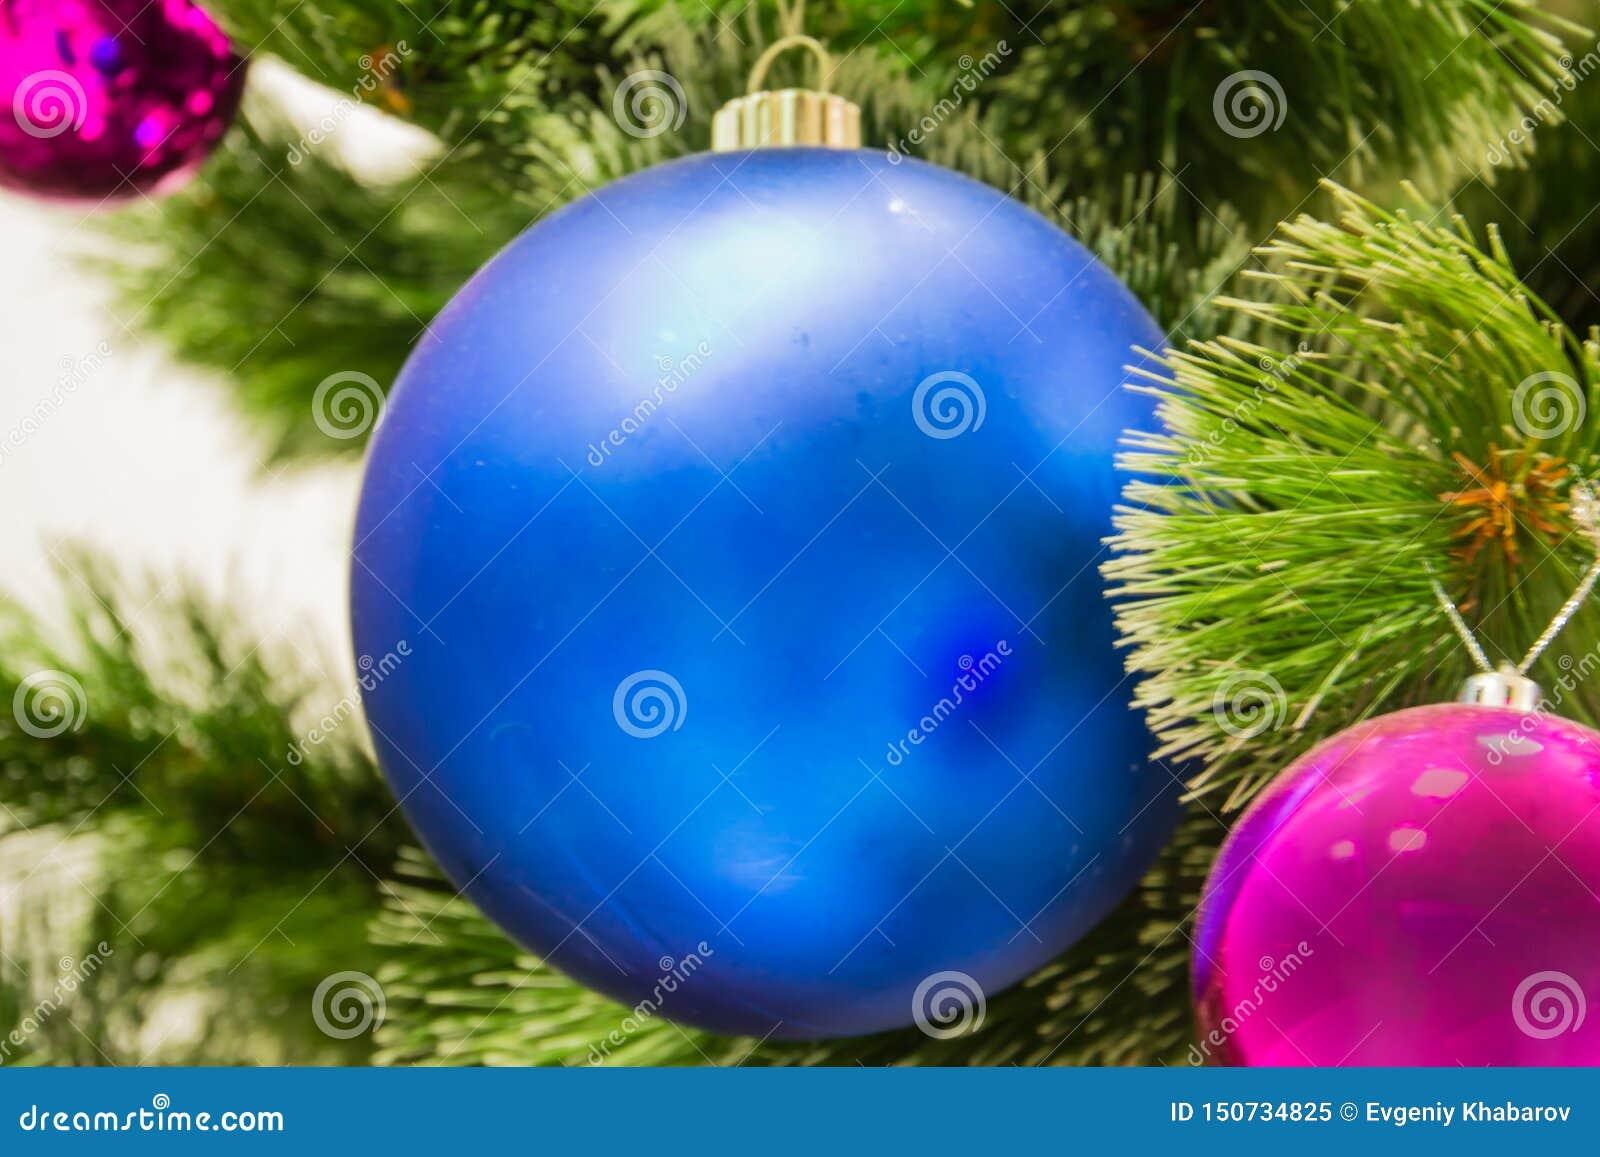 Decora??es na ?rvore de Natal Uma grande bola azul